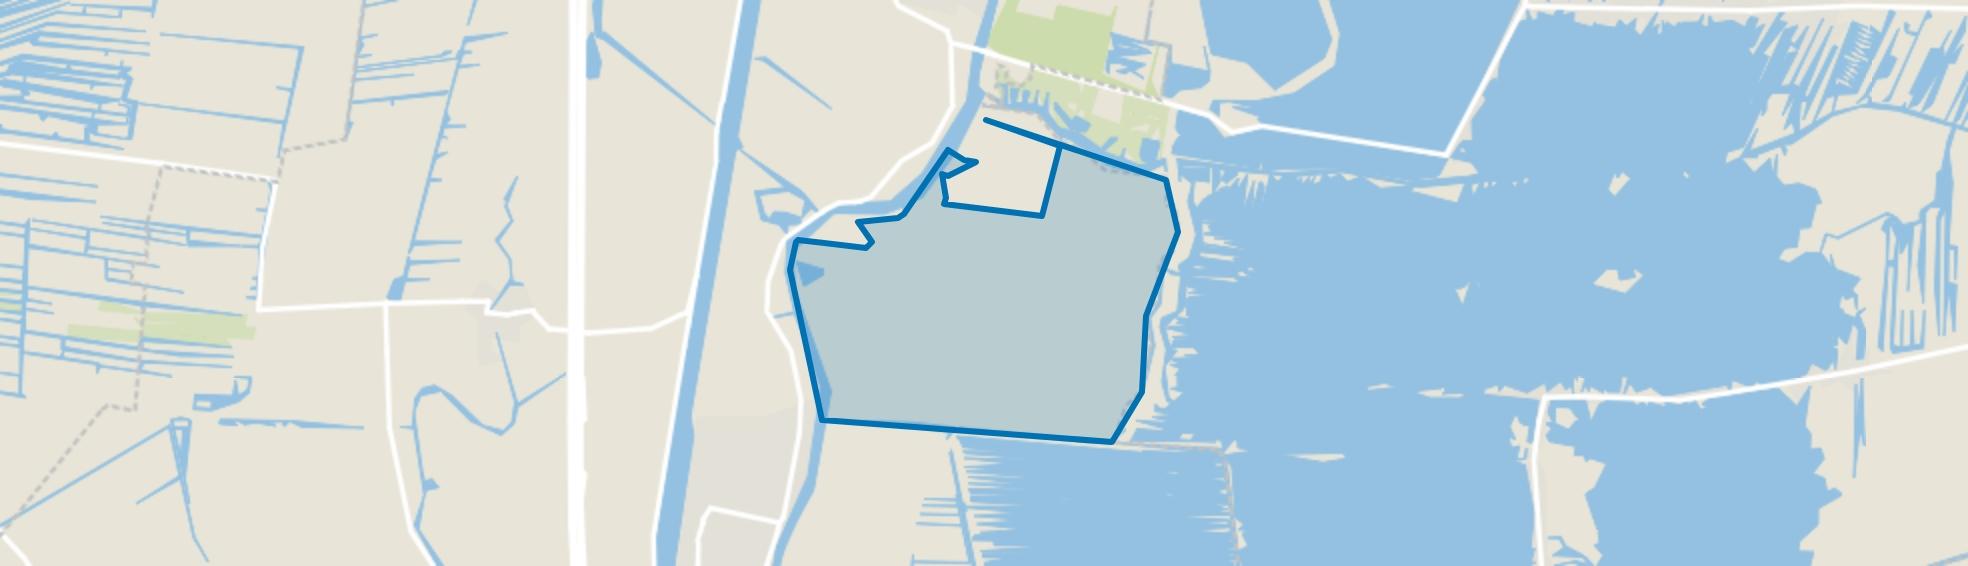 Polder Mijnden, Nieuwersluis map